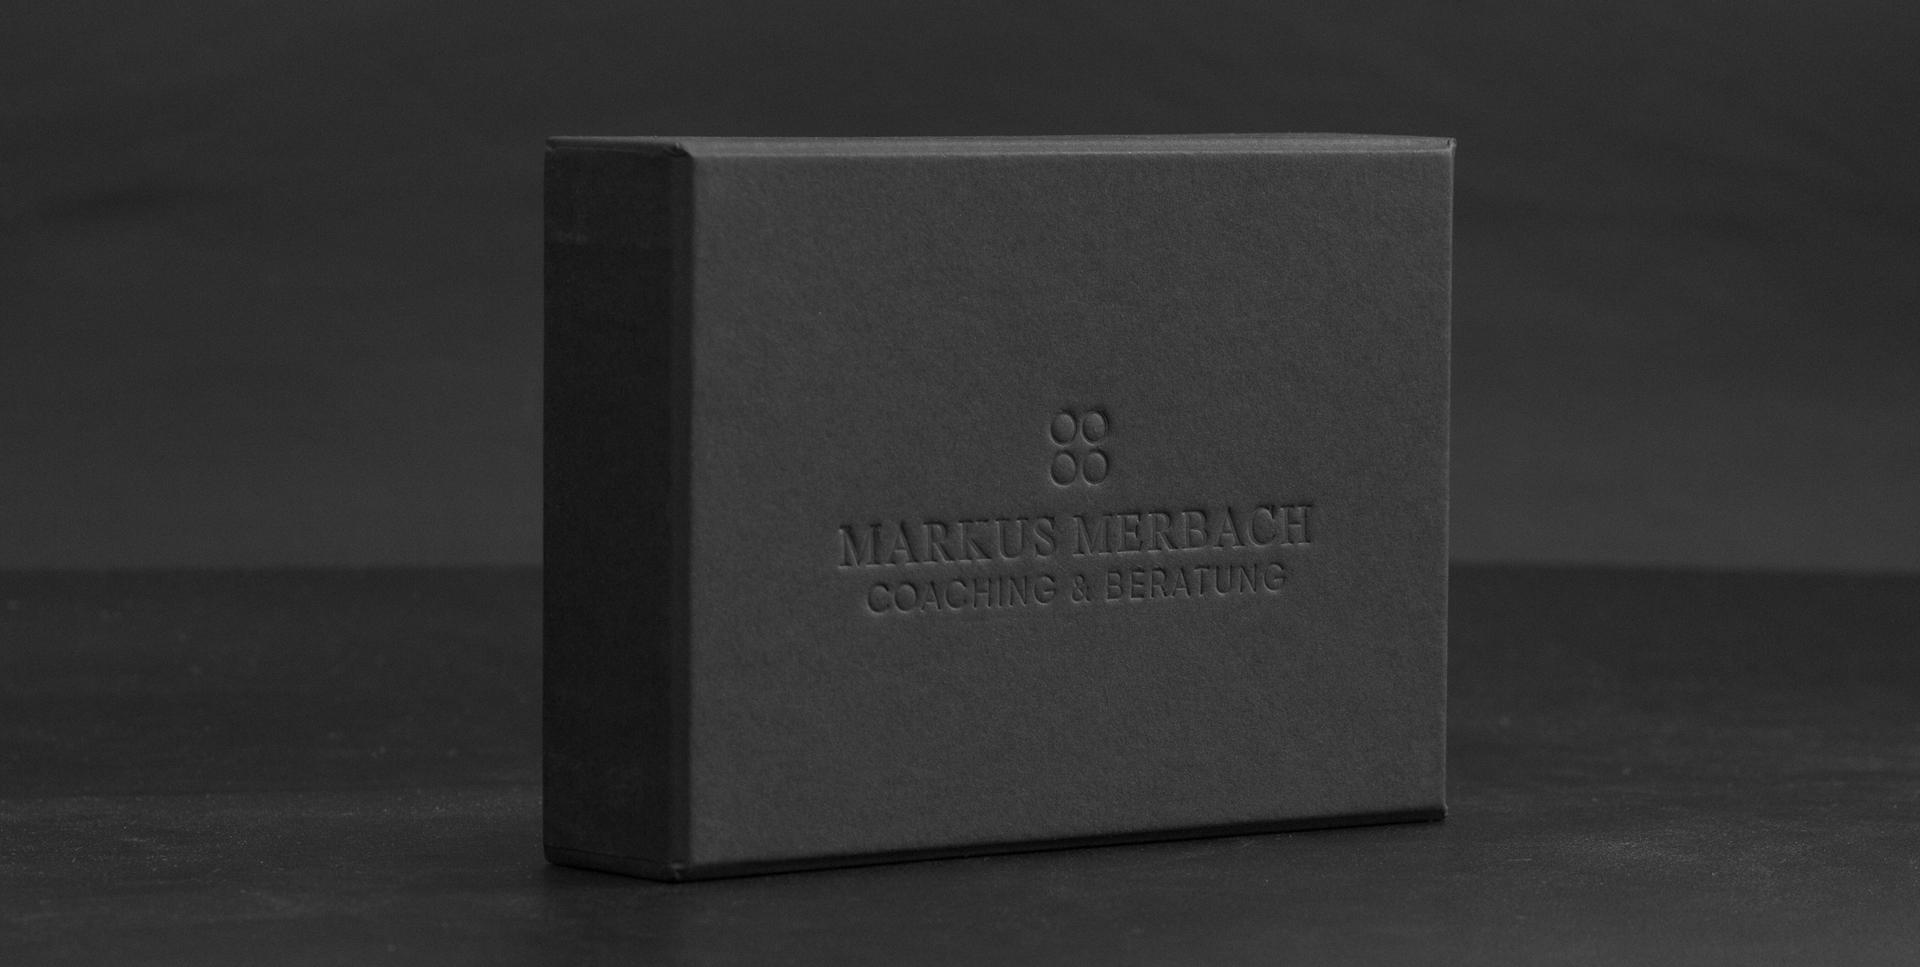 Markus-Merbach-box-detail-3-STUDIO-MUNIQUE-1